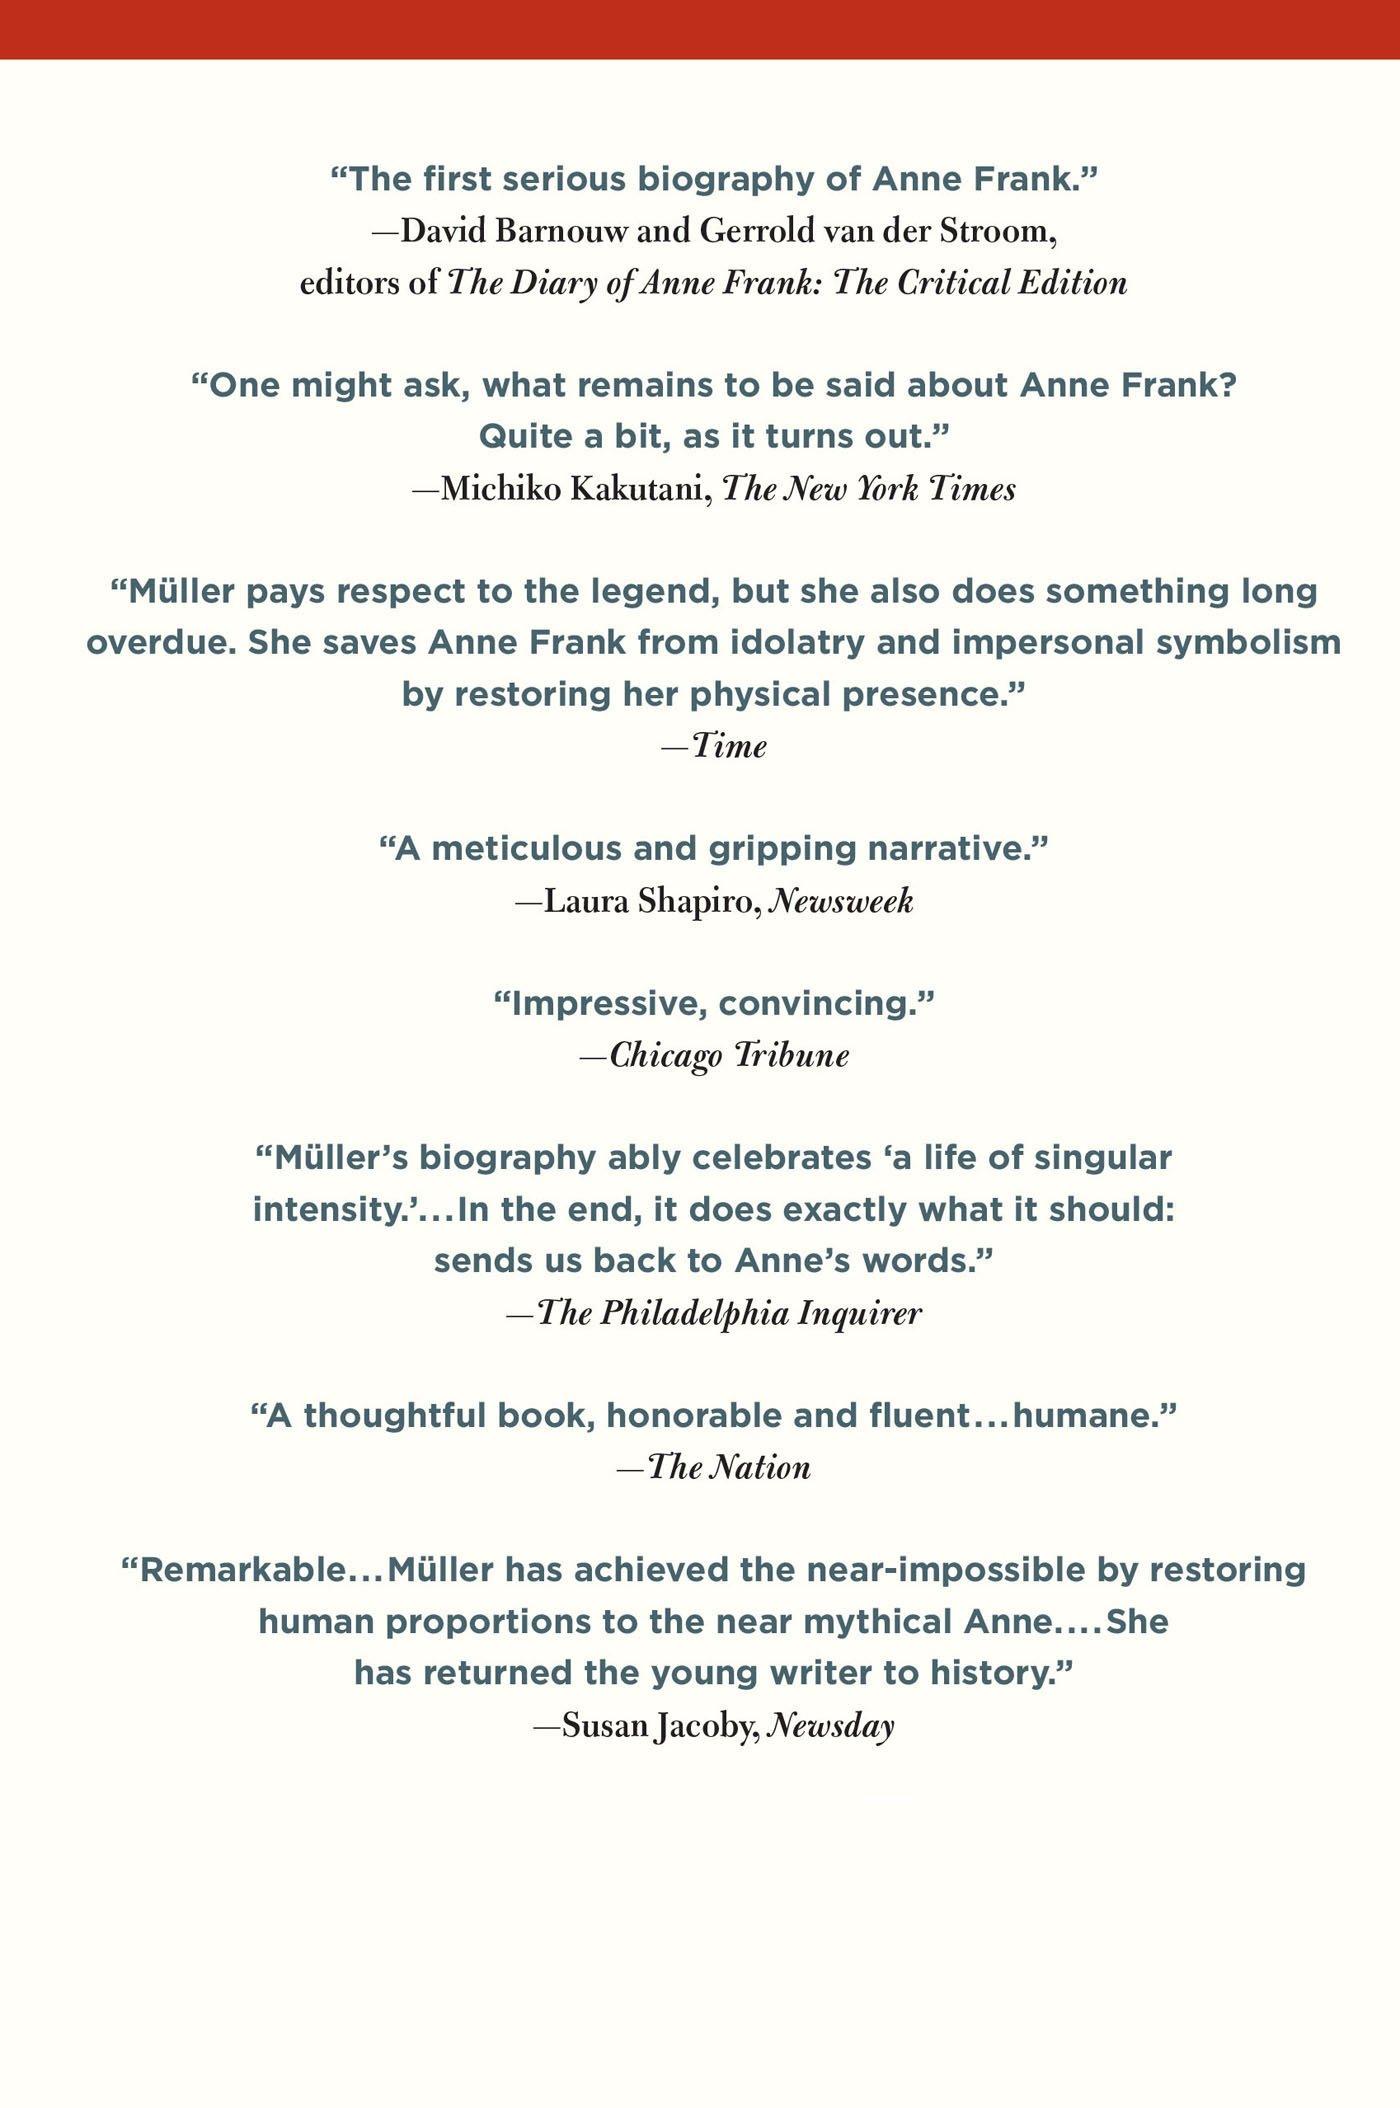 Anne Frank: The Biography: Melissa Müller: 9780805087314: Amazon.com: Books